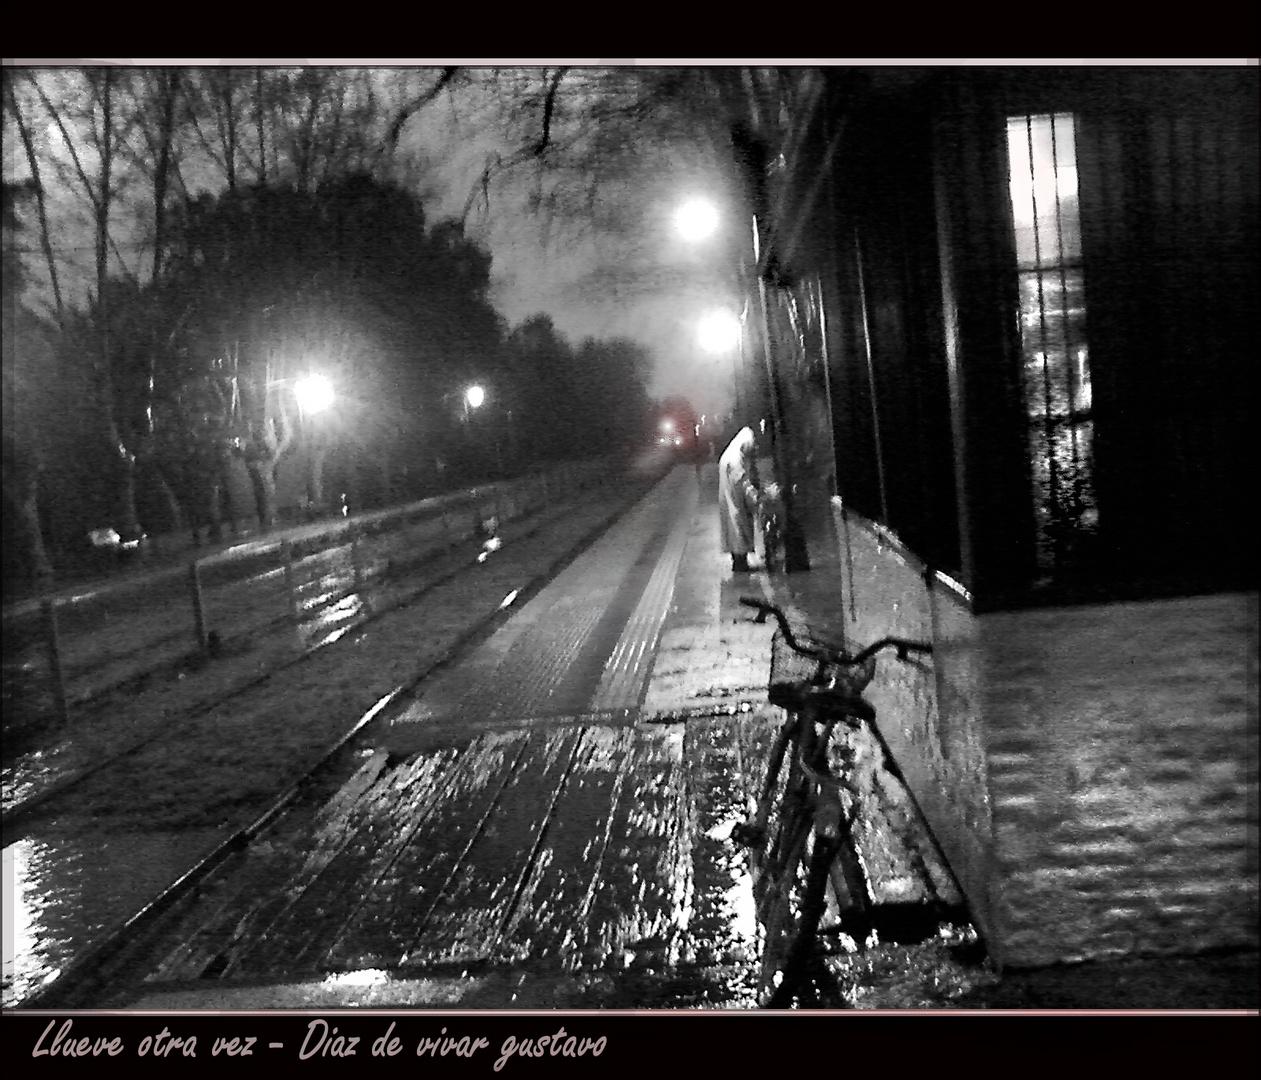 Llueve otra vez - Diaz de vivar gustavo